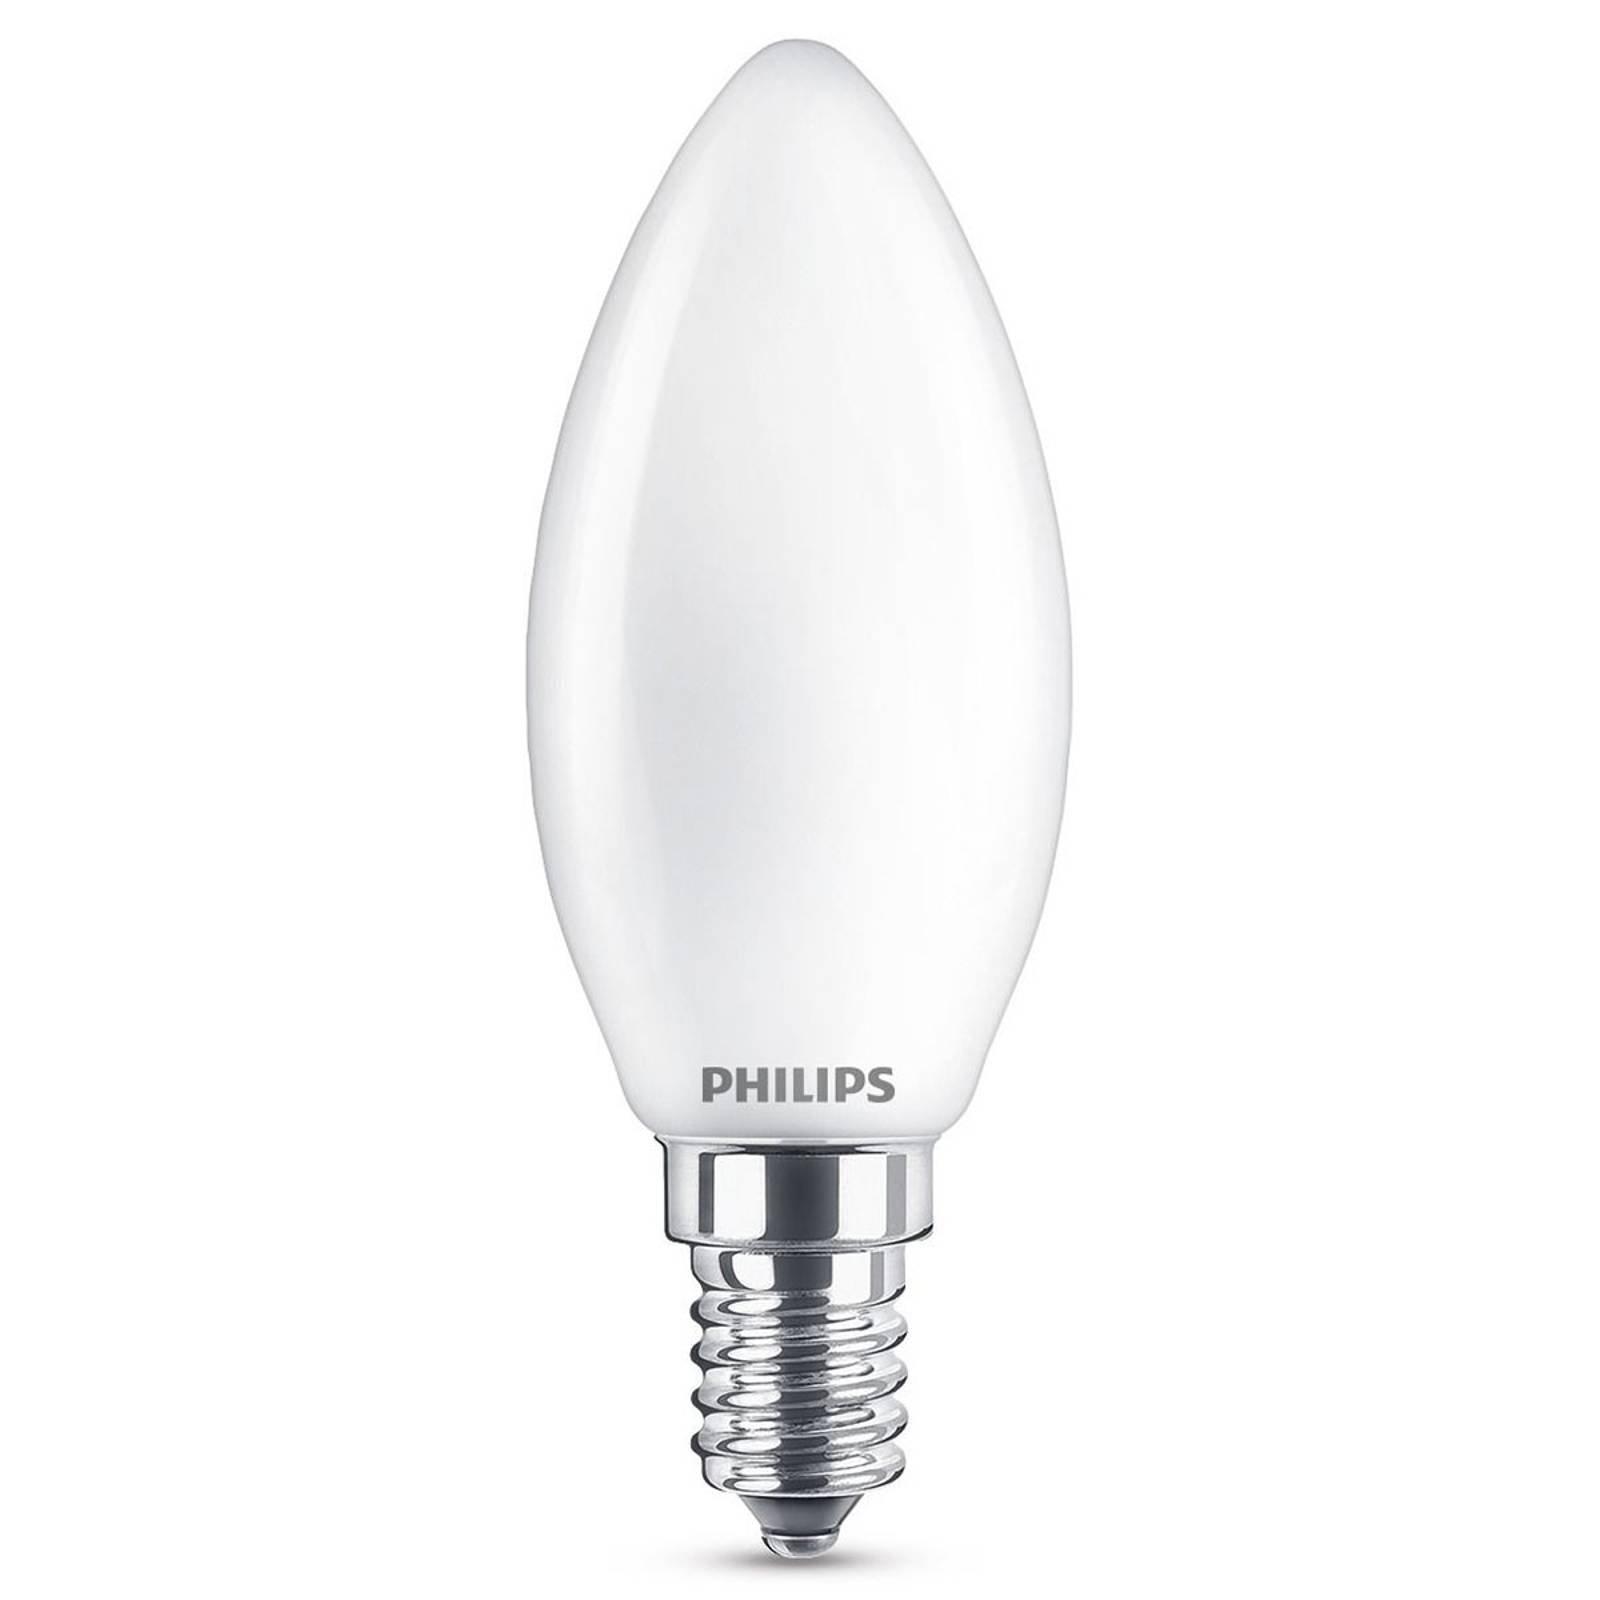 E14 4,3W 827 LED-kjernelampe, opal